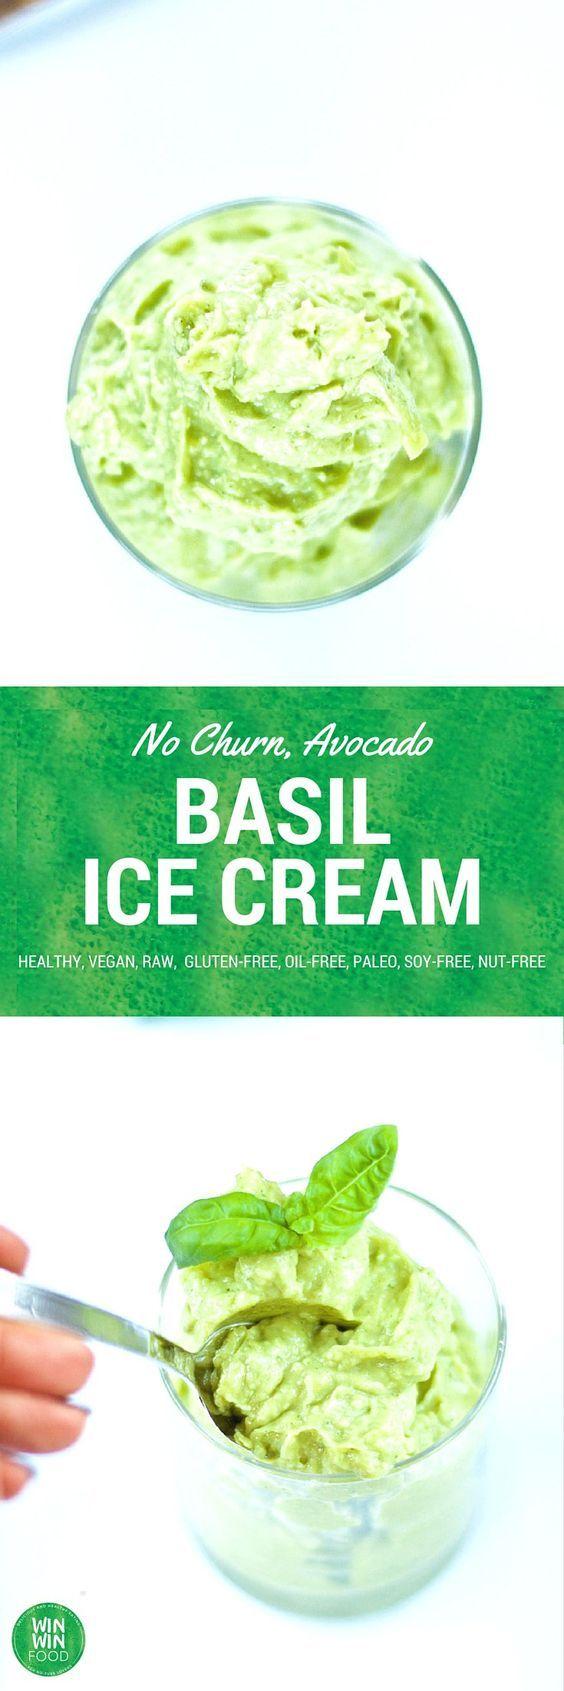 Basil Ice Cream | WIN-WINFOOD.com #healthy #vegan #raw, #glutenfree #paleo #nutfree